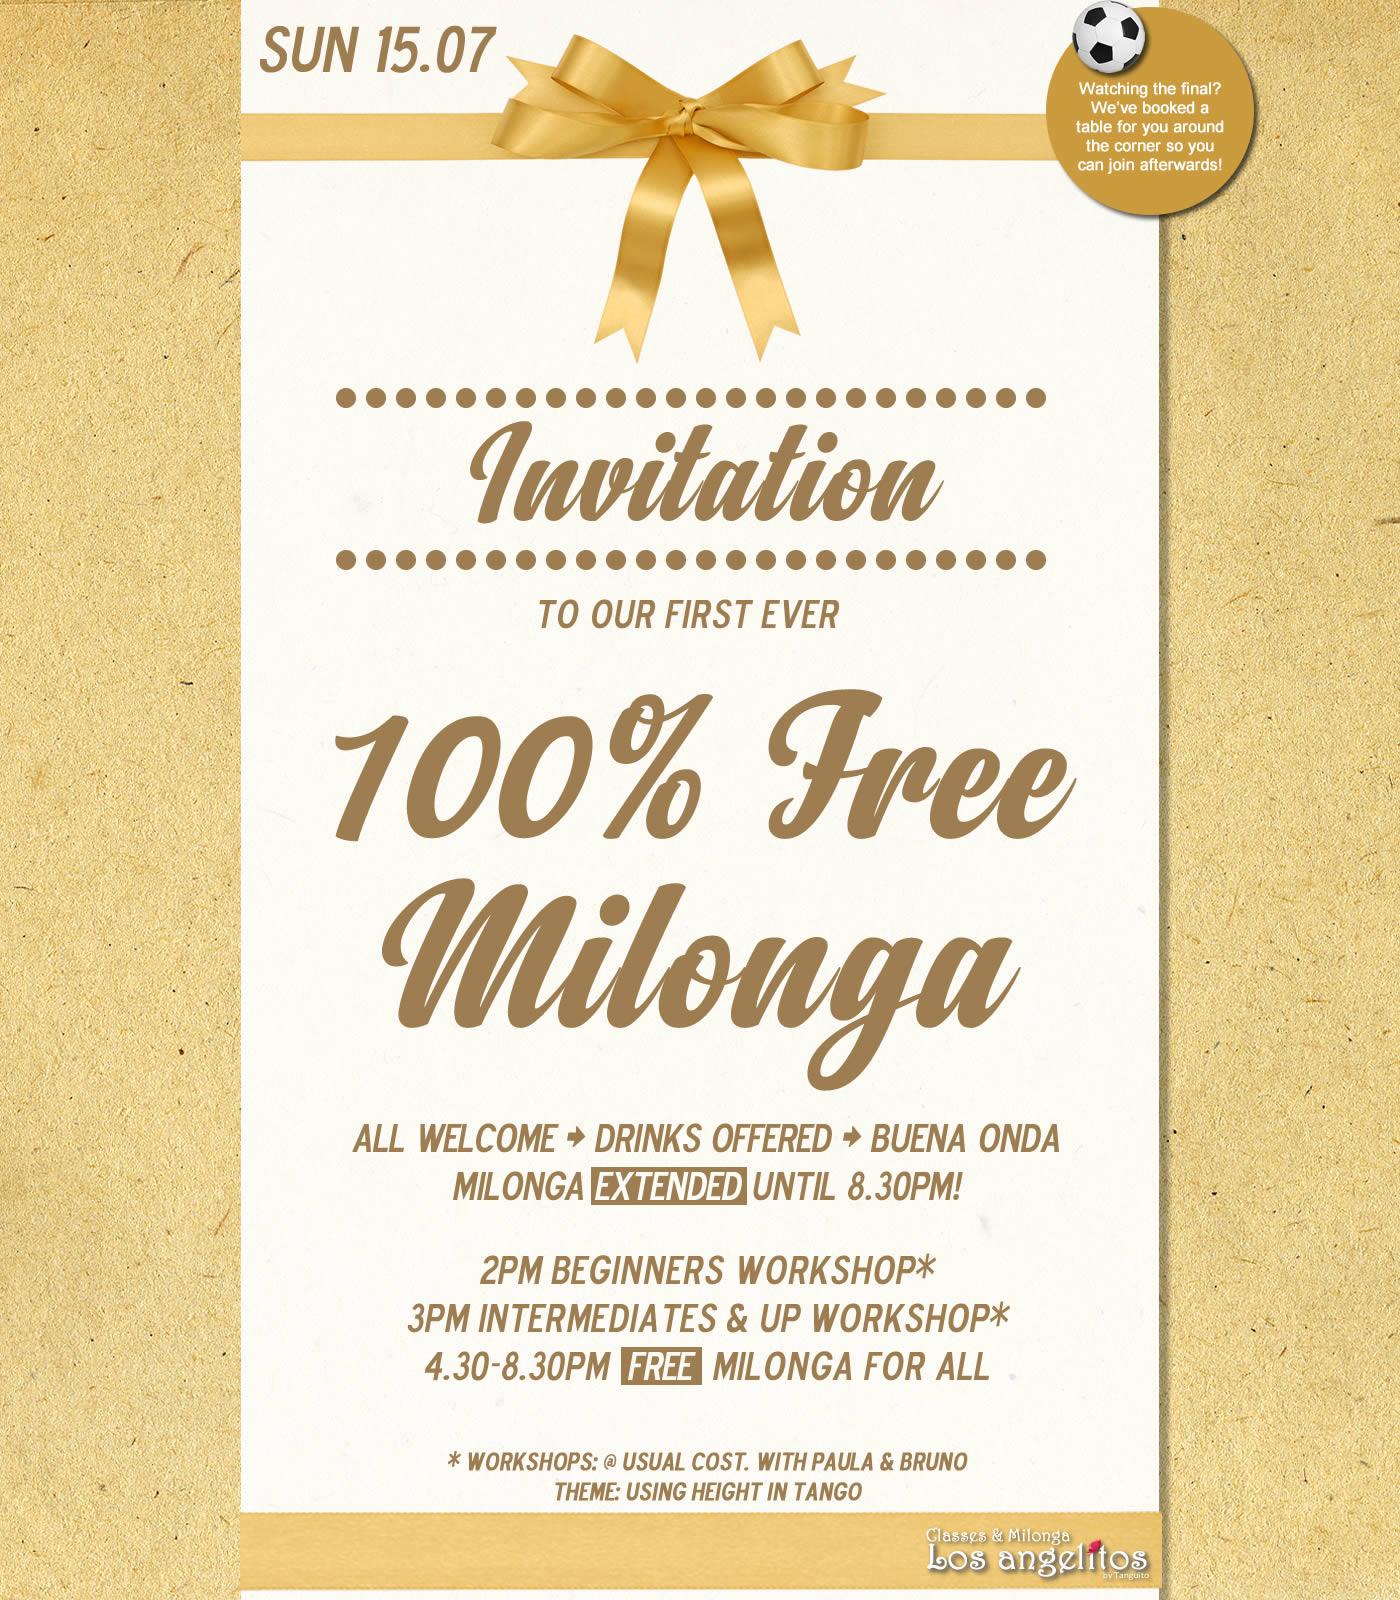 freemilonga1507